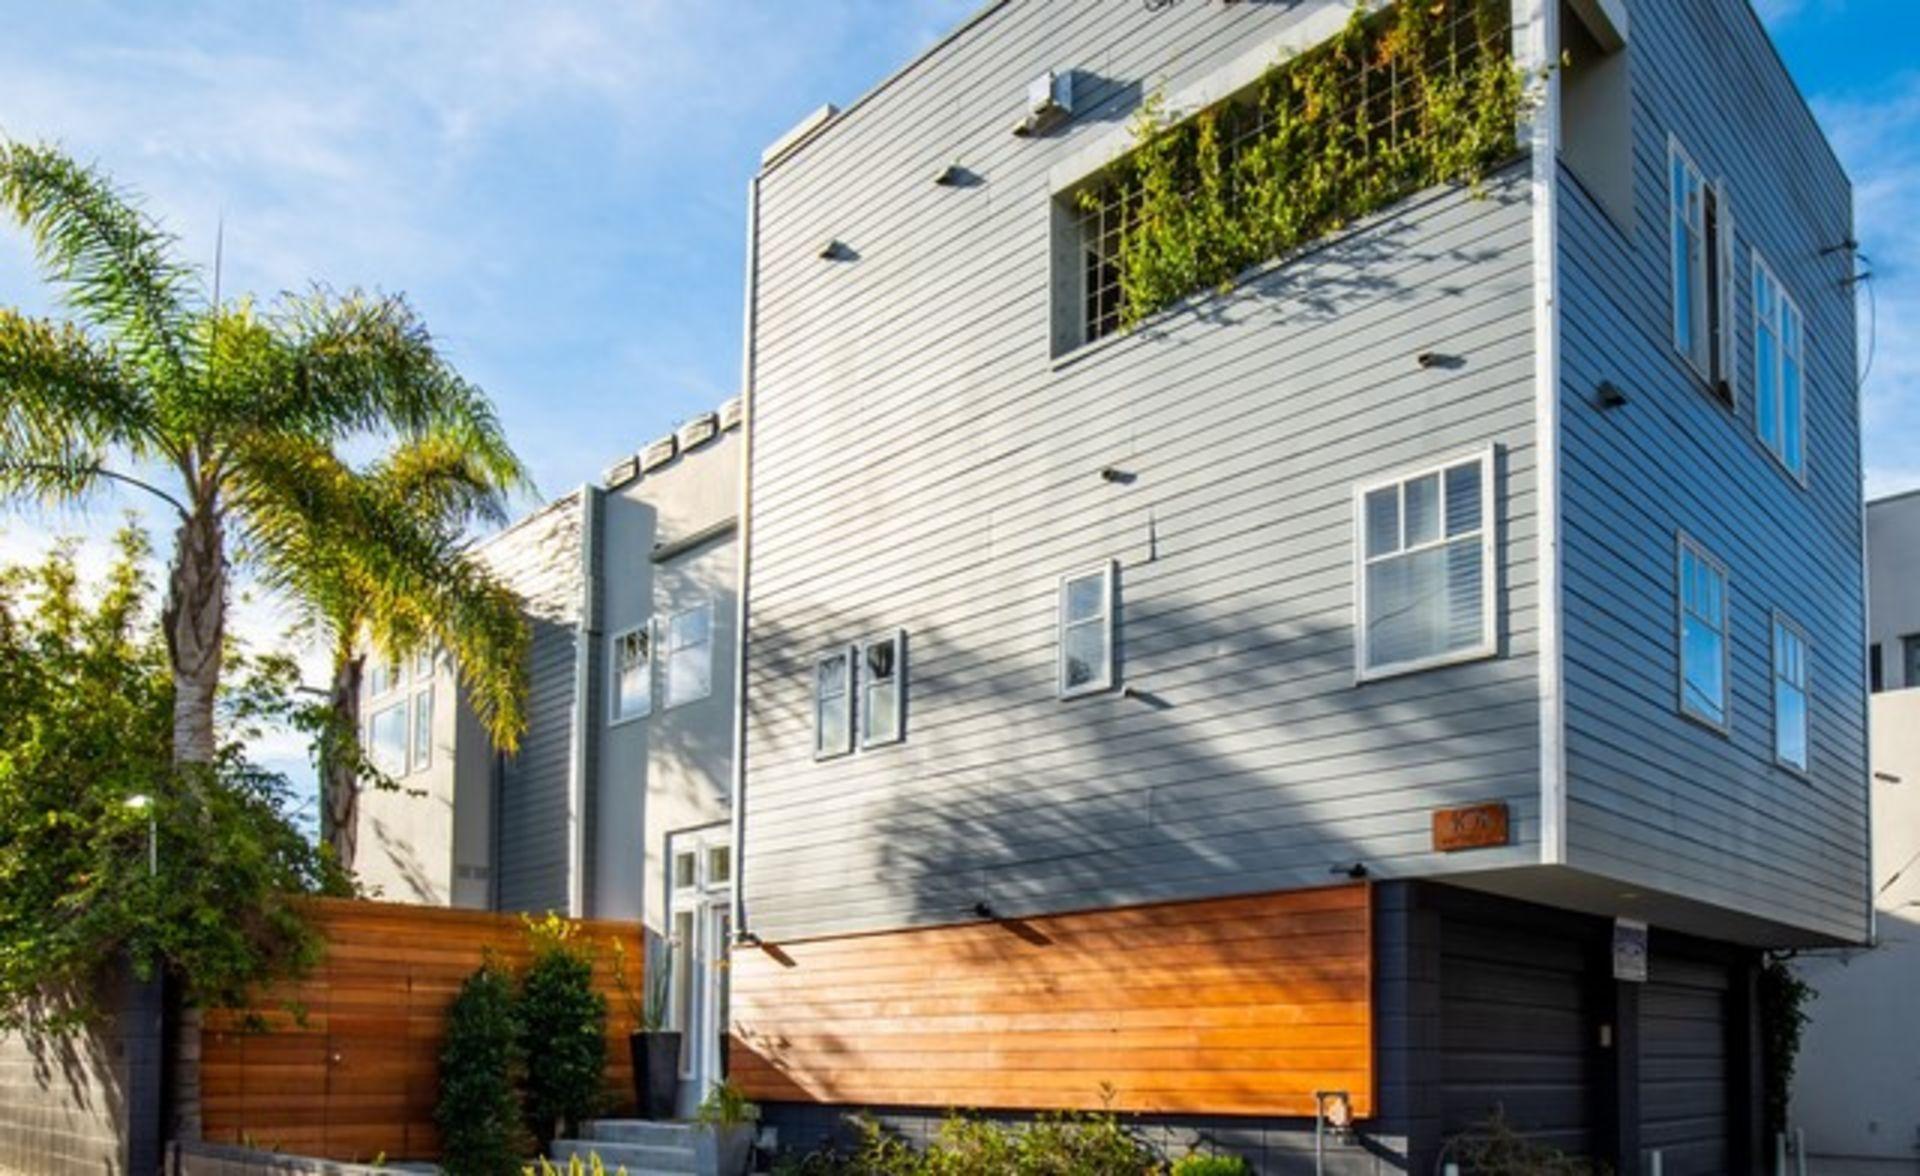 Sleek Venice Walkstreet Duplex w/ Panoramic Views